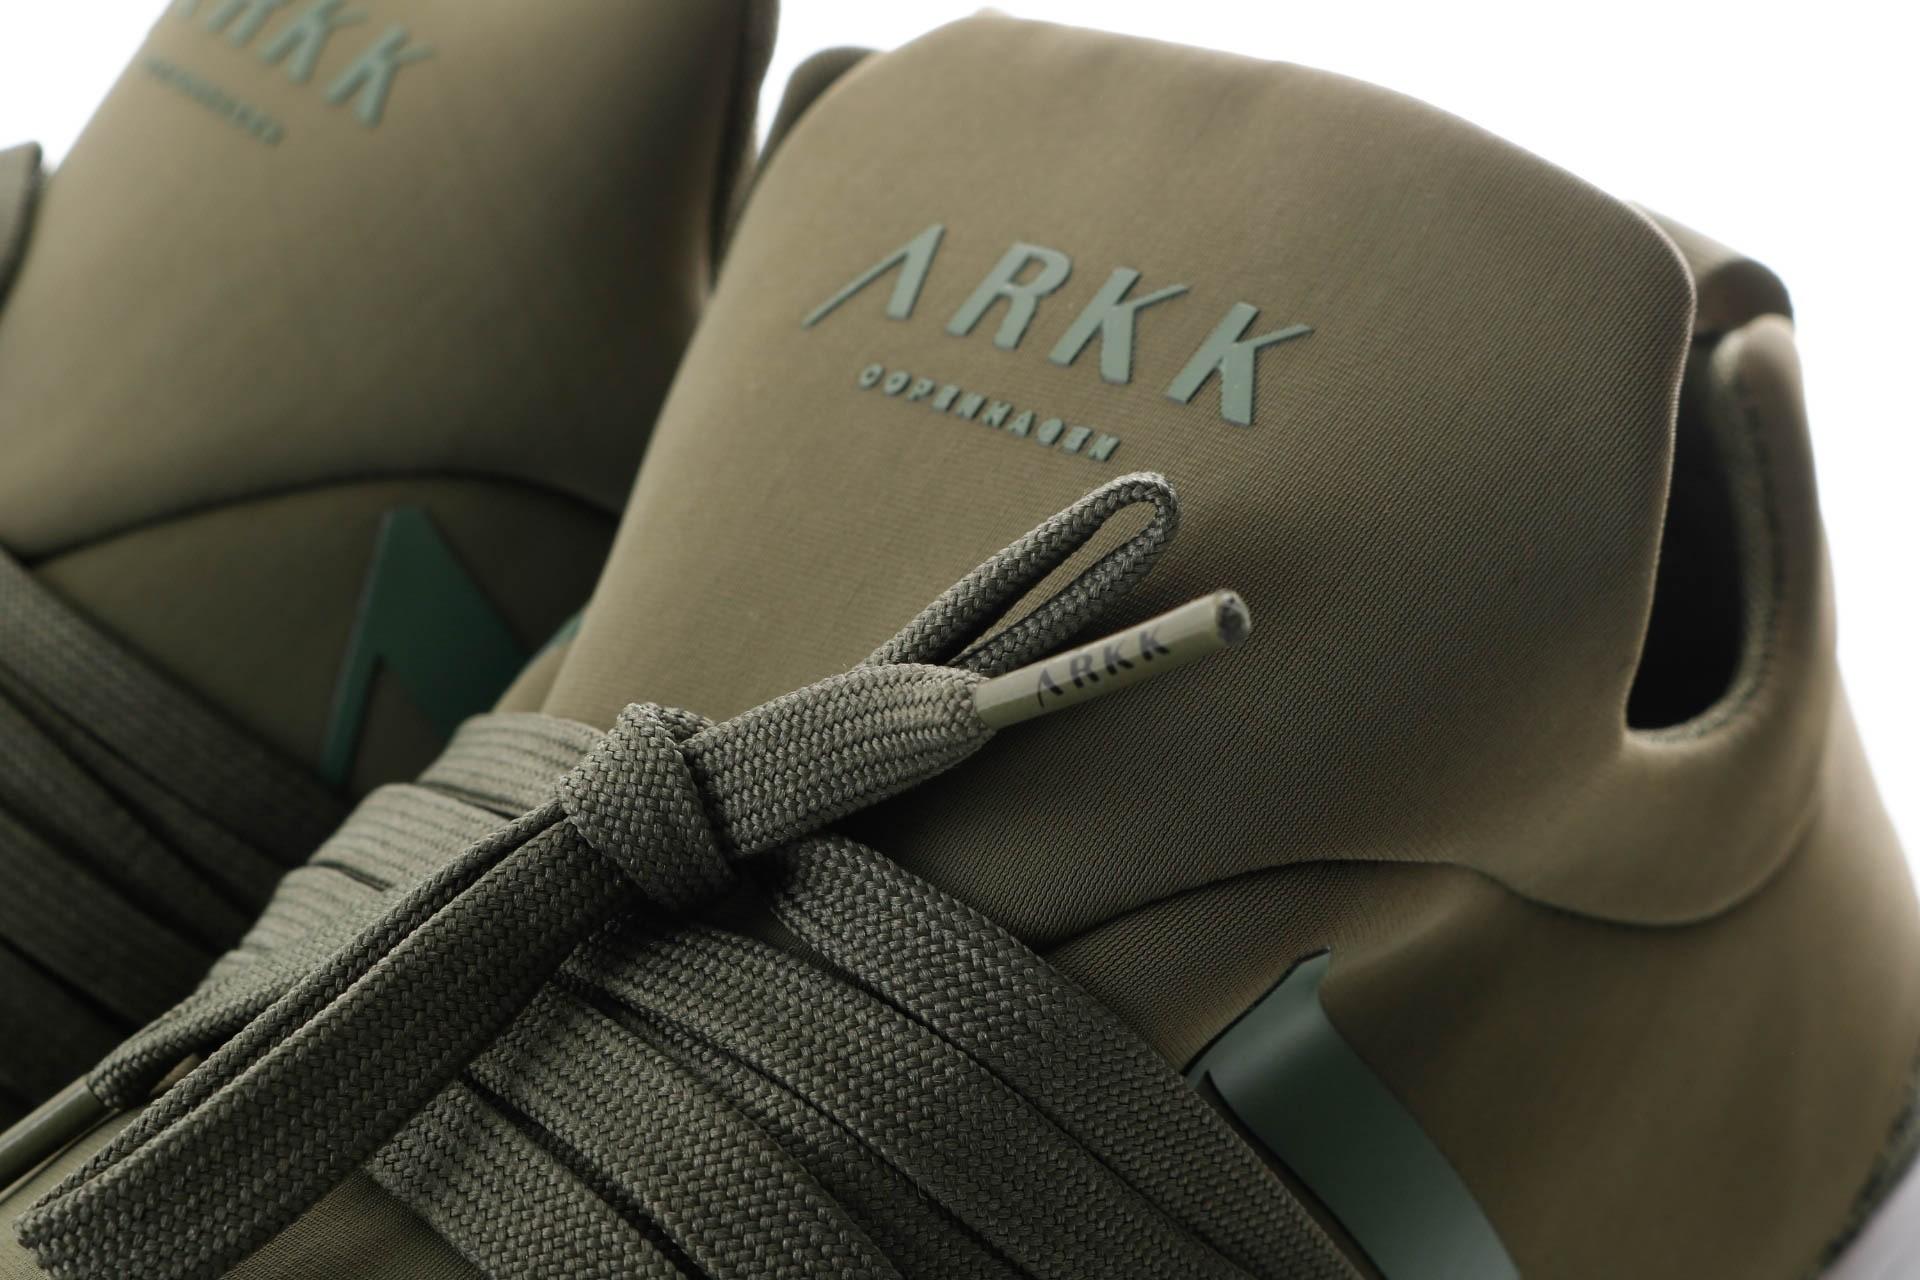 Afbeelding van Arkk Raven Mesh S-E15 AS1460-0036-M Sneakers Army